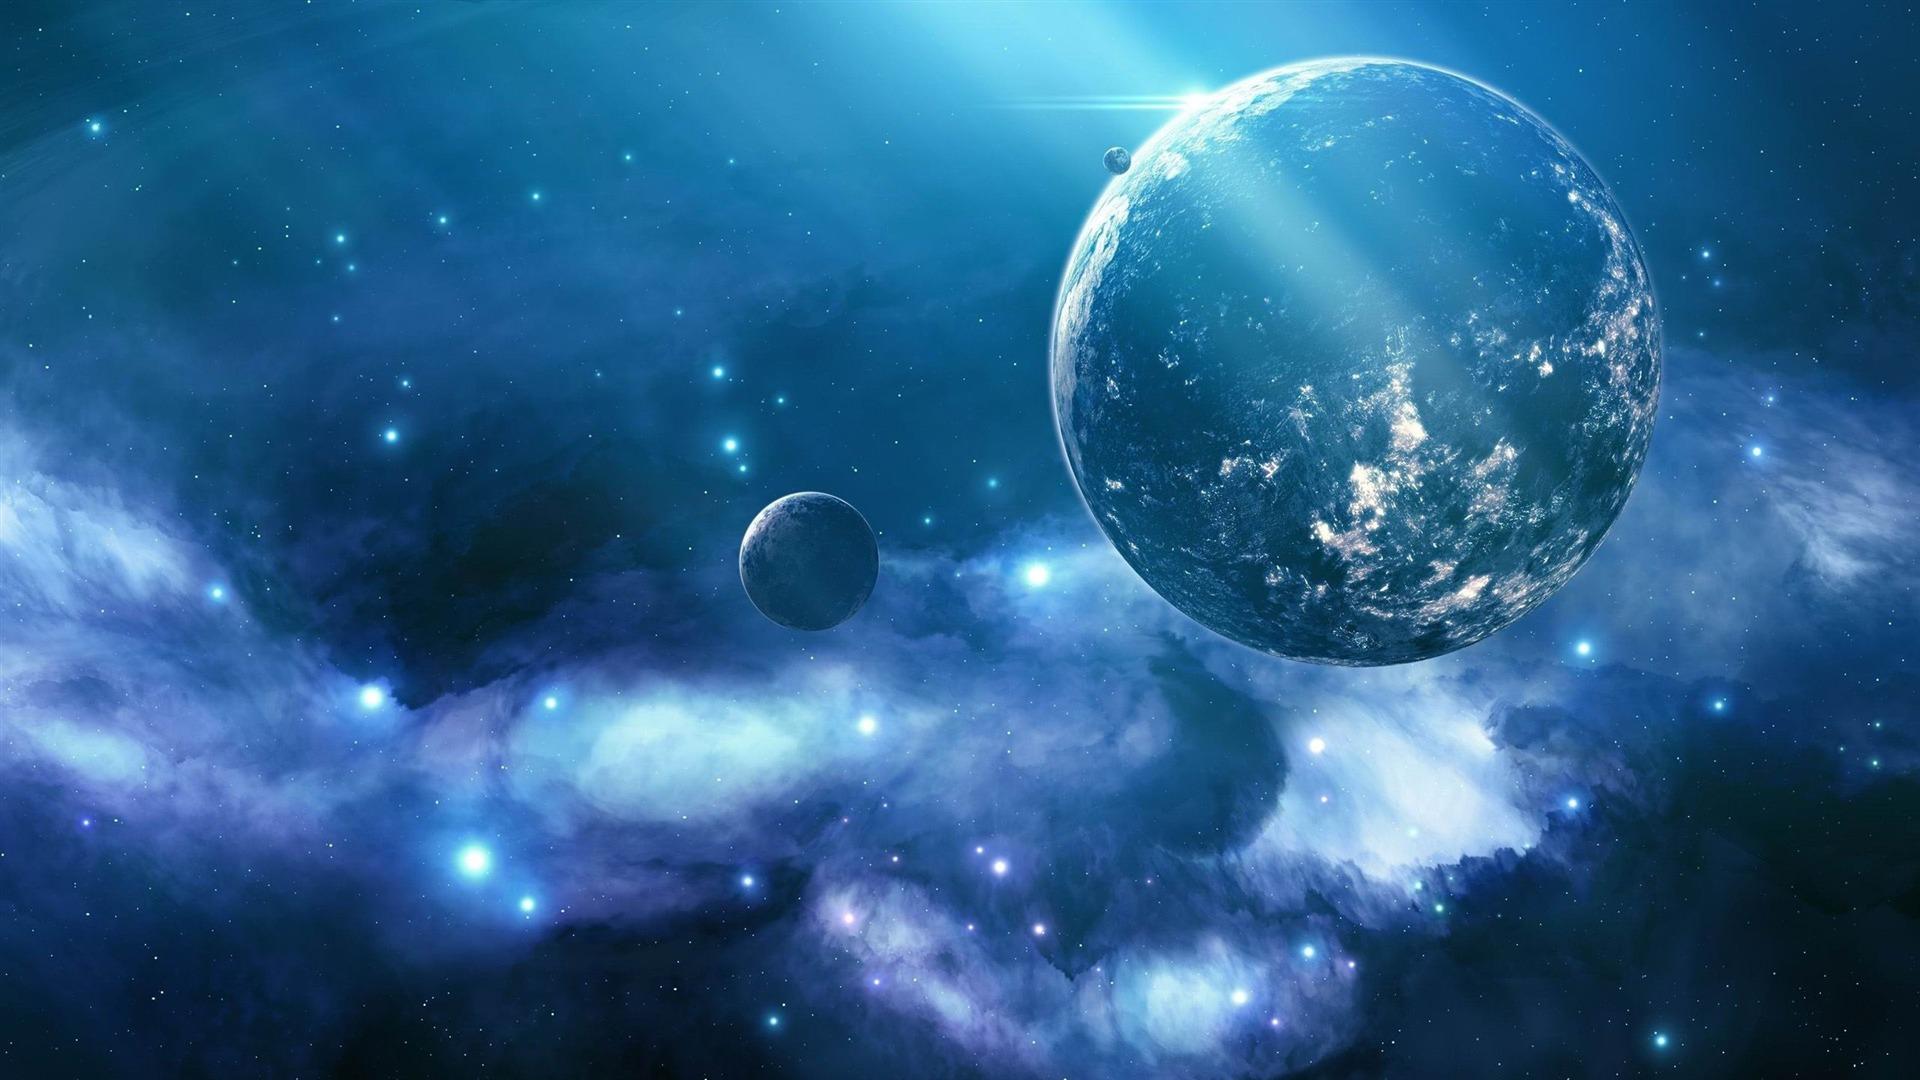 - Space explorer wallpaper ...